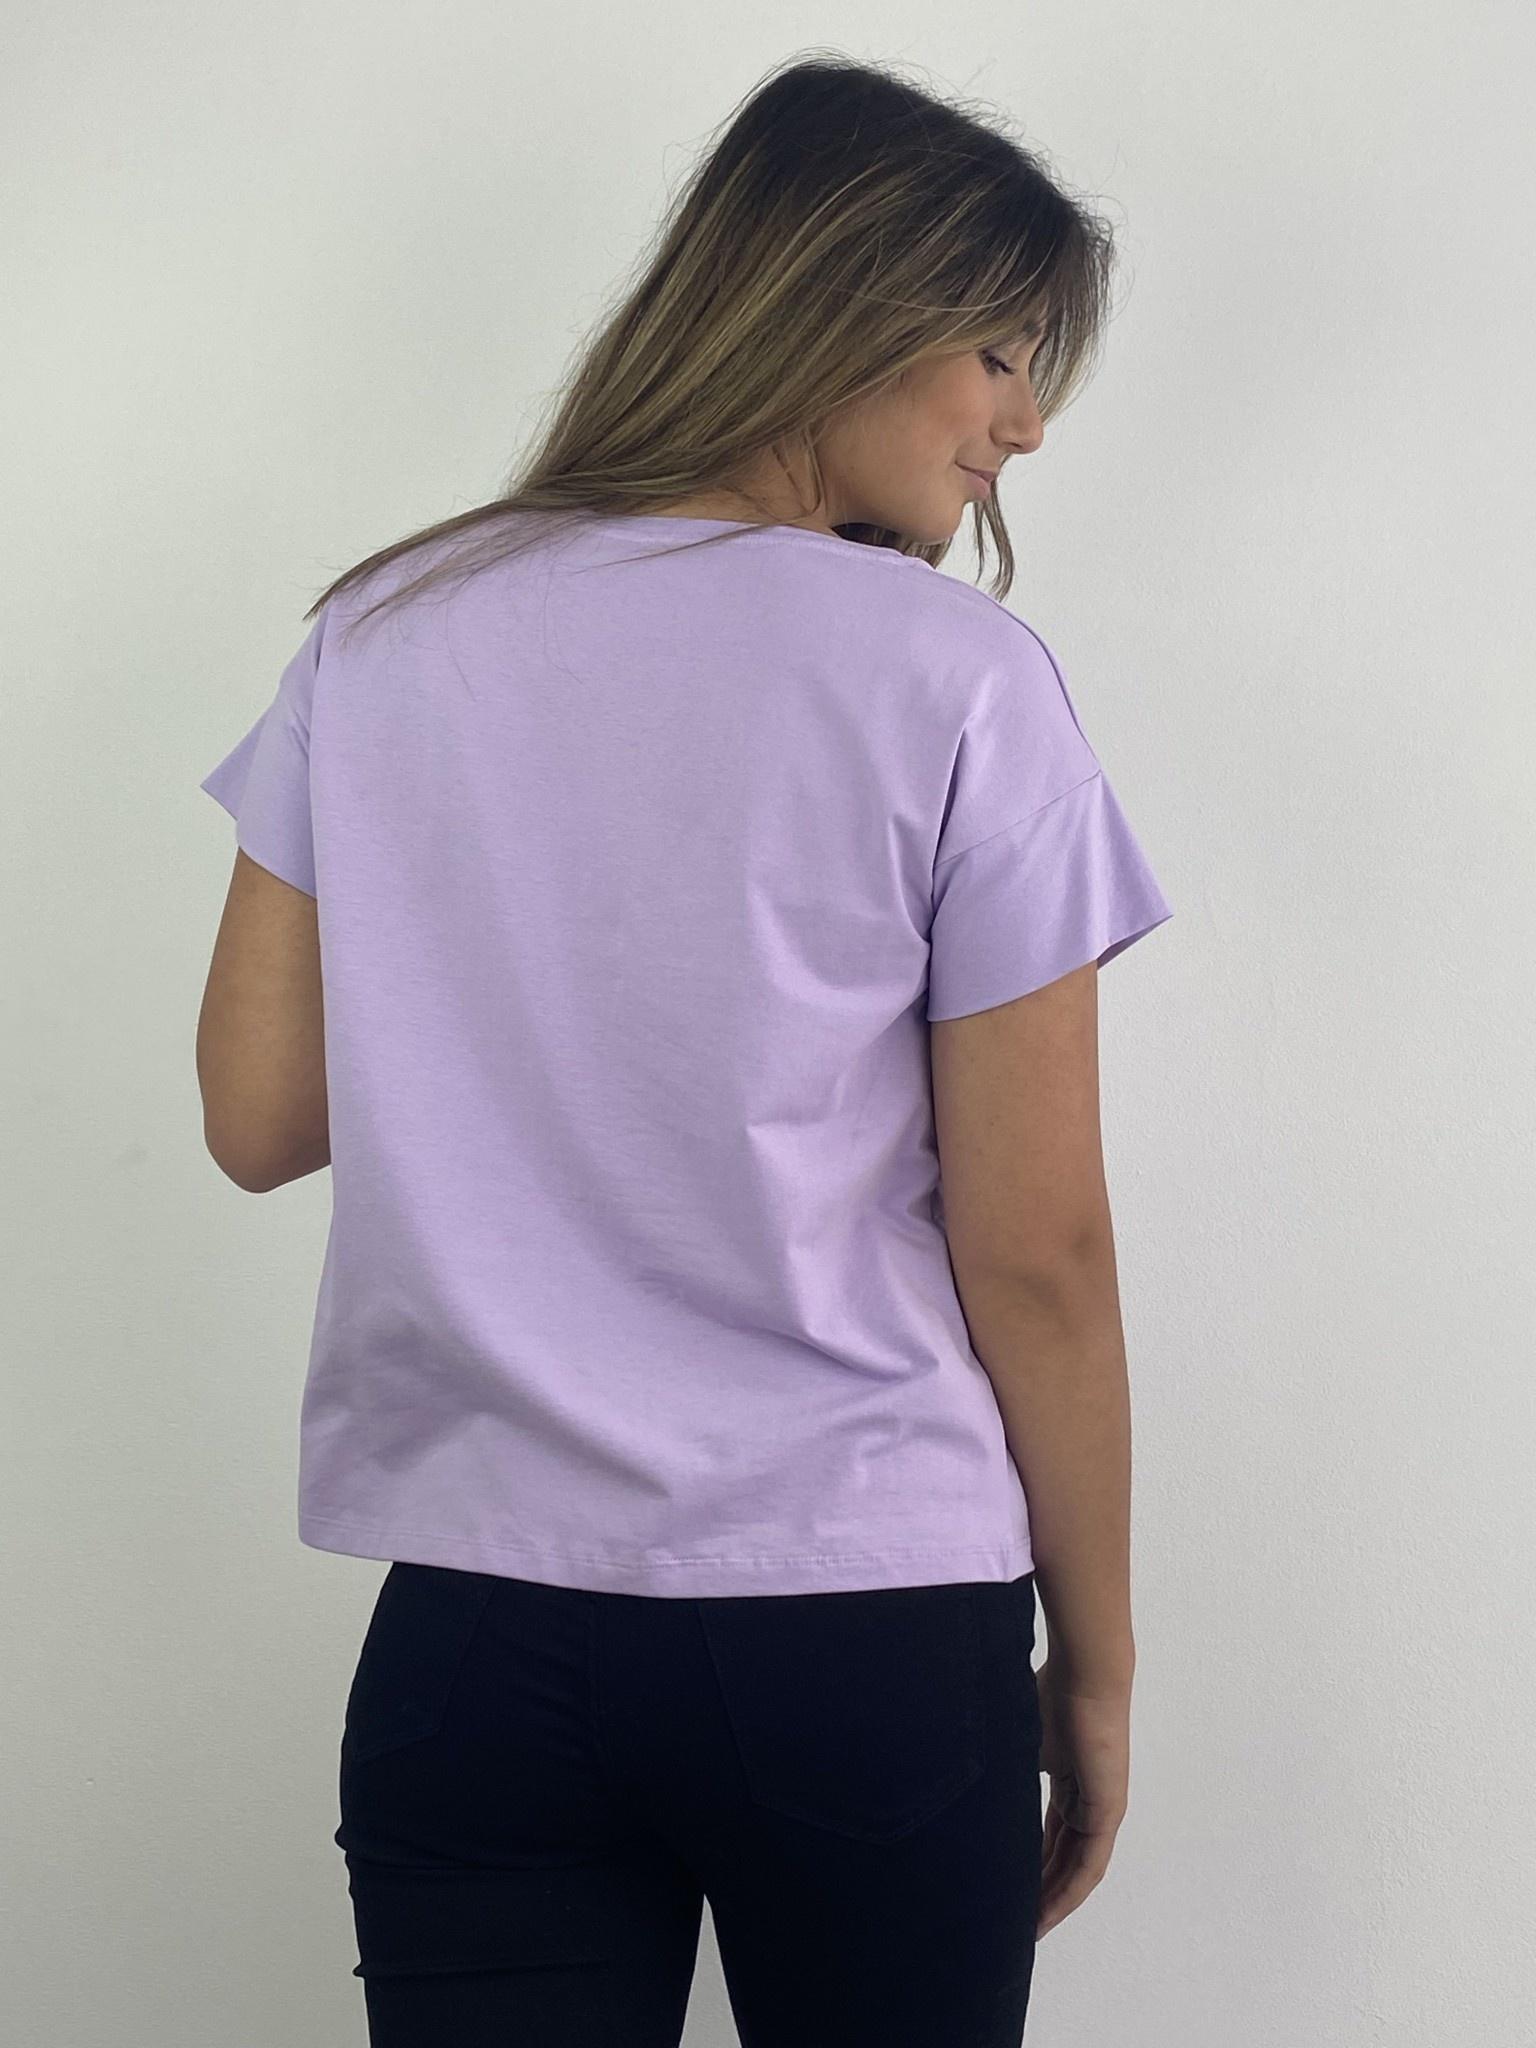 Jacky essential t-shirt Lila-3